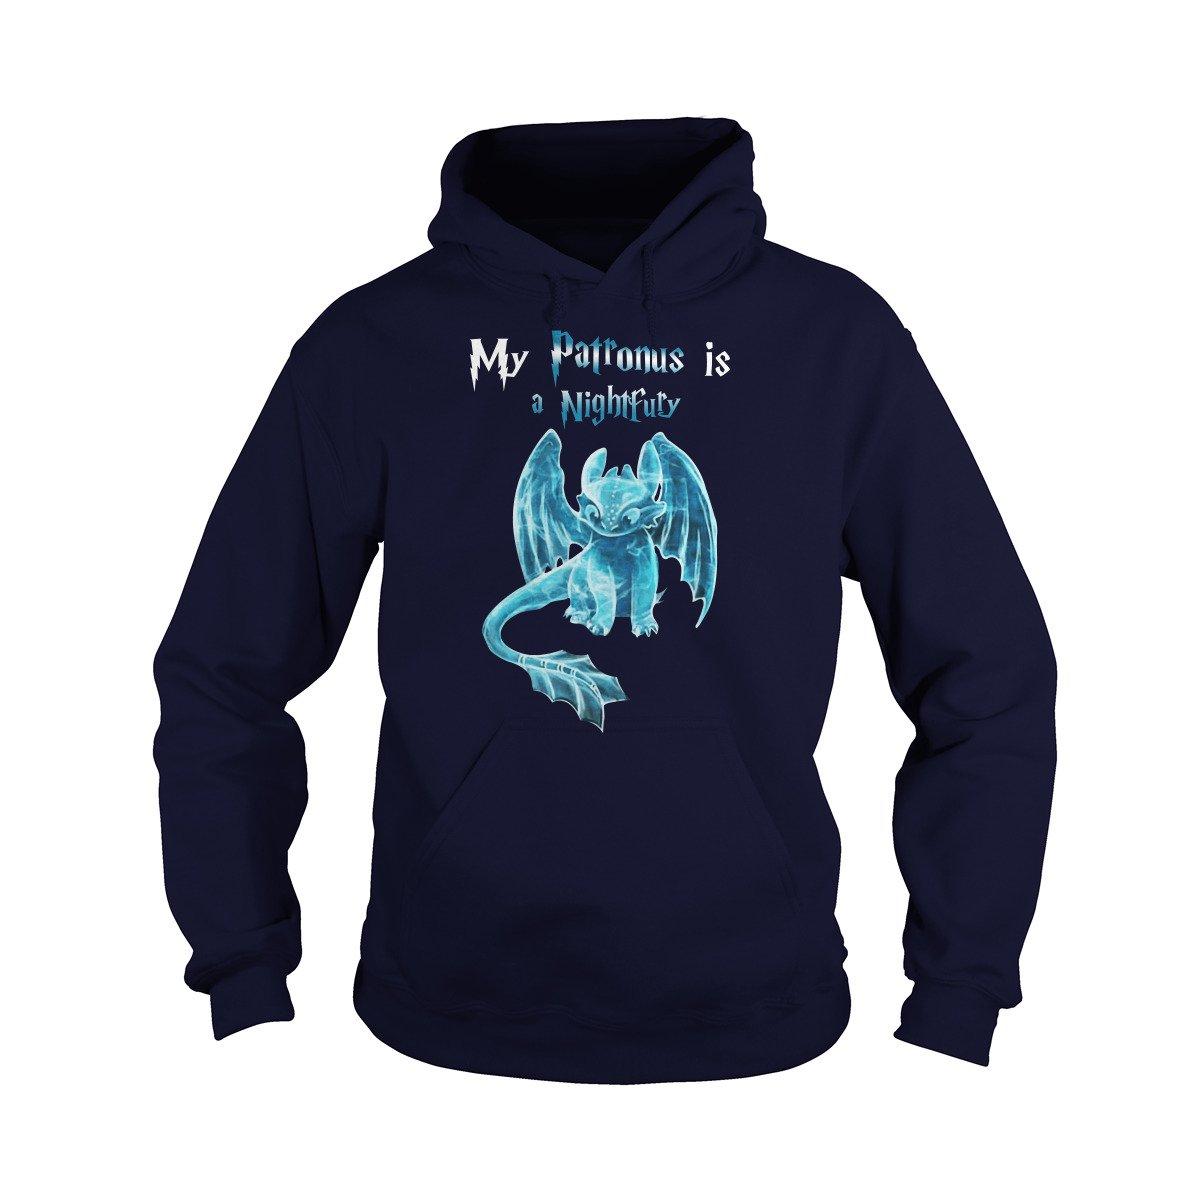 Sleeky Patronus Nightfury T-Shirt